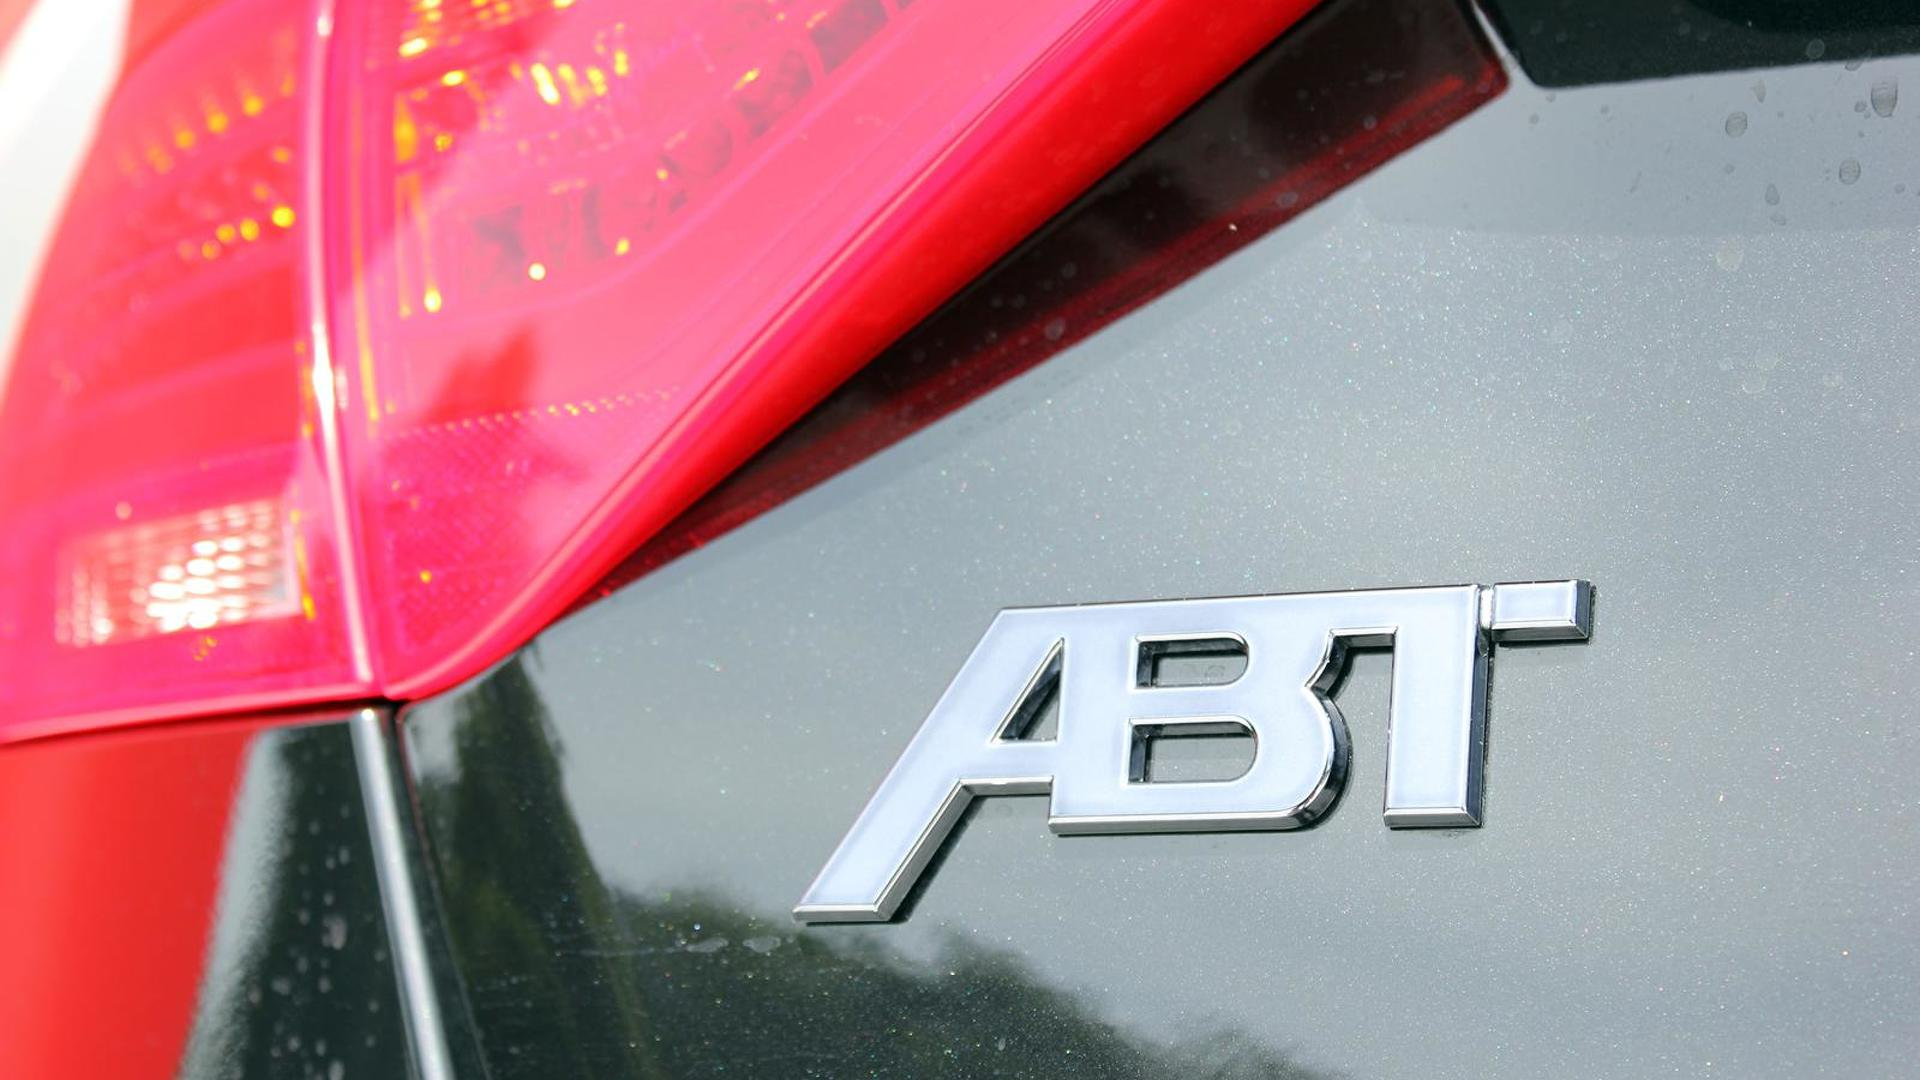 Логотип ABT на крышке багажника Audi A5 Sportback